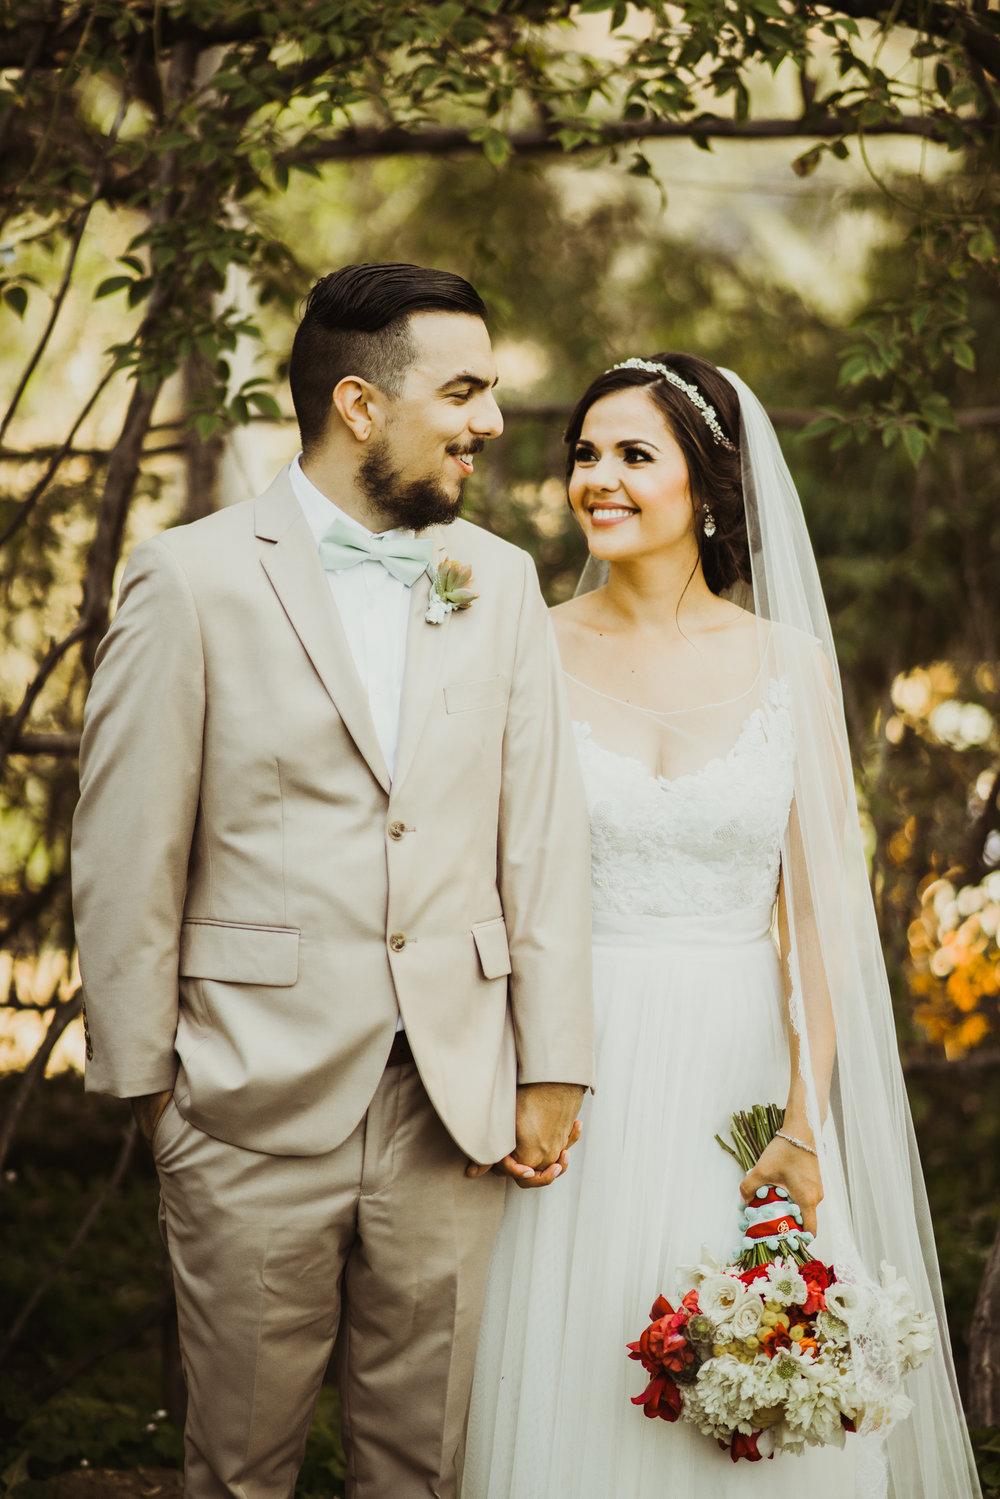 ©Isaiah + Taylor Photography - Brendan + Stefana, Quail Haven Farm Wedding, Vista-103.jpg